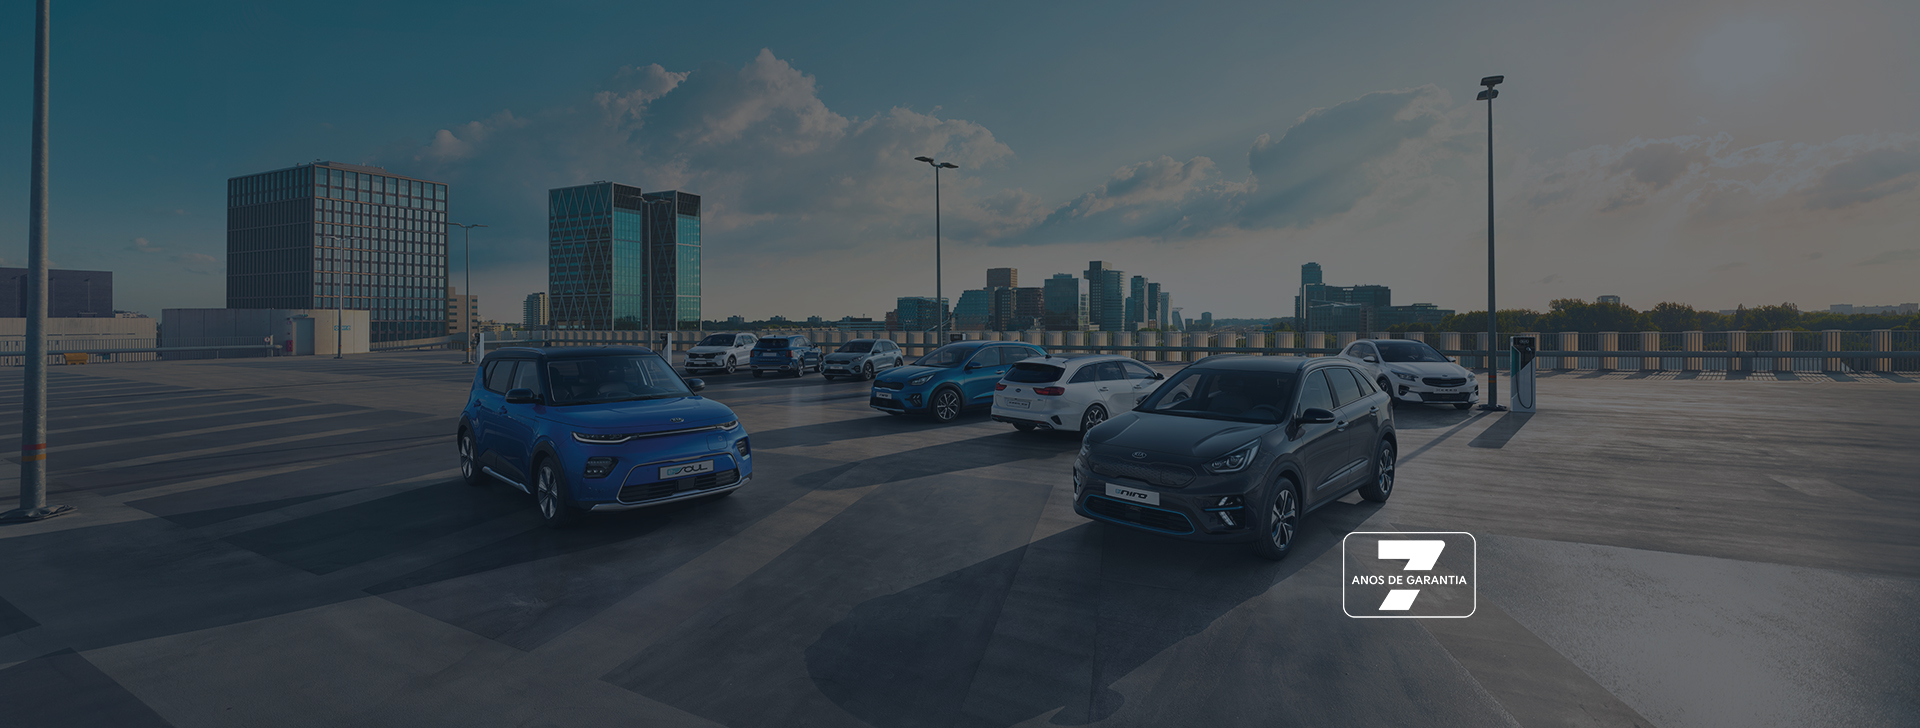 Introducing the new Kia E-Niro